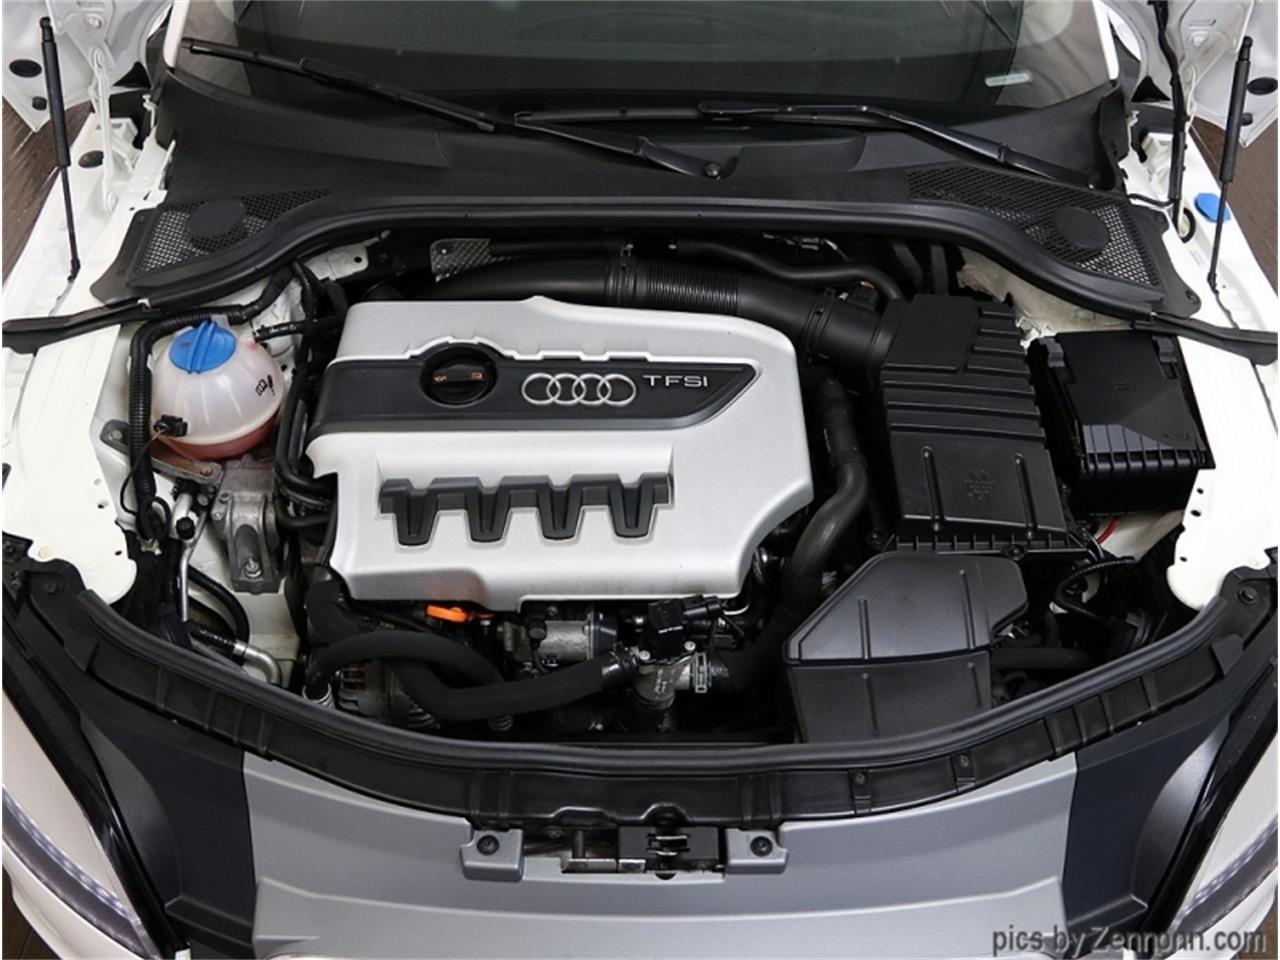 2010 Audi TT (CC-1368862) for sale in Addison, Illinois